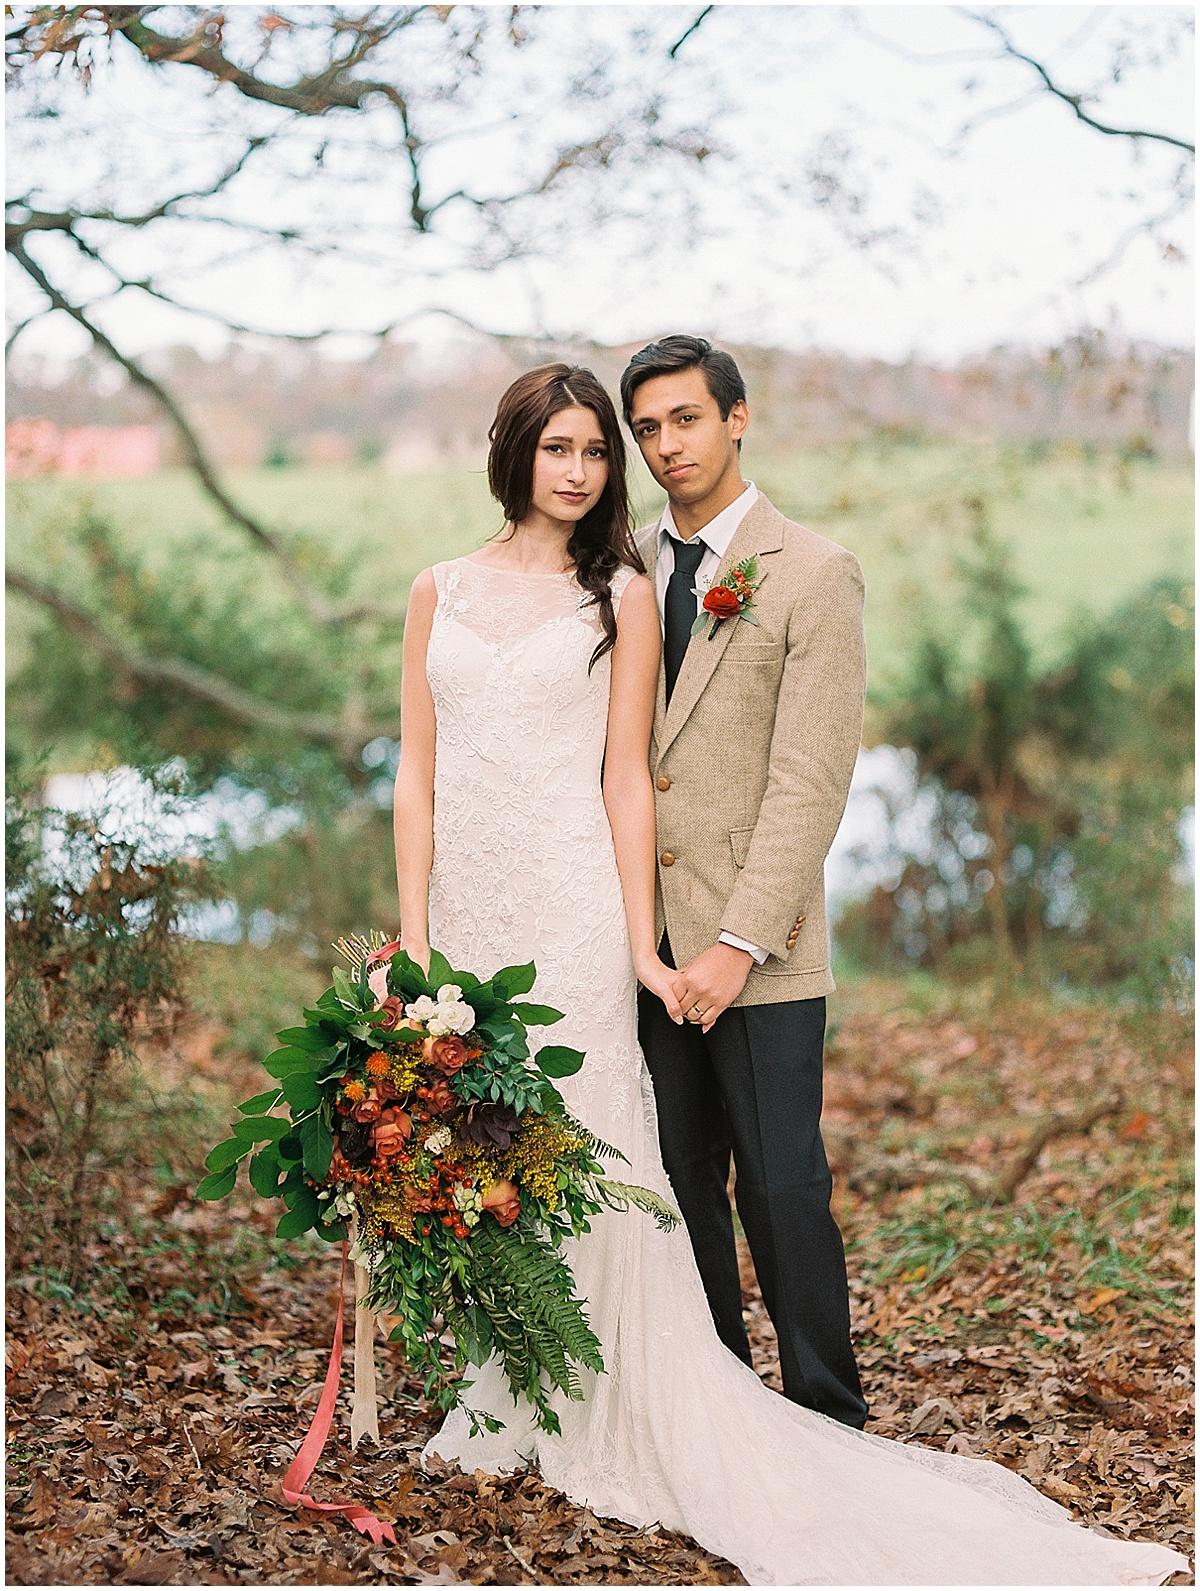 Abigail_Malone_Fall_Wedding_Knoxville_Film_Portra_400_Kodak_Mountain_Views_Abby_Elizabeth-22.jpg